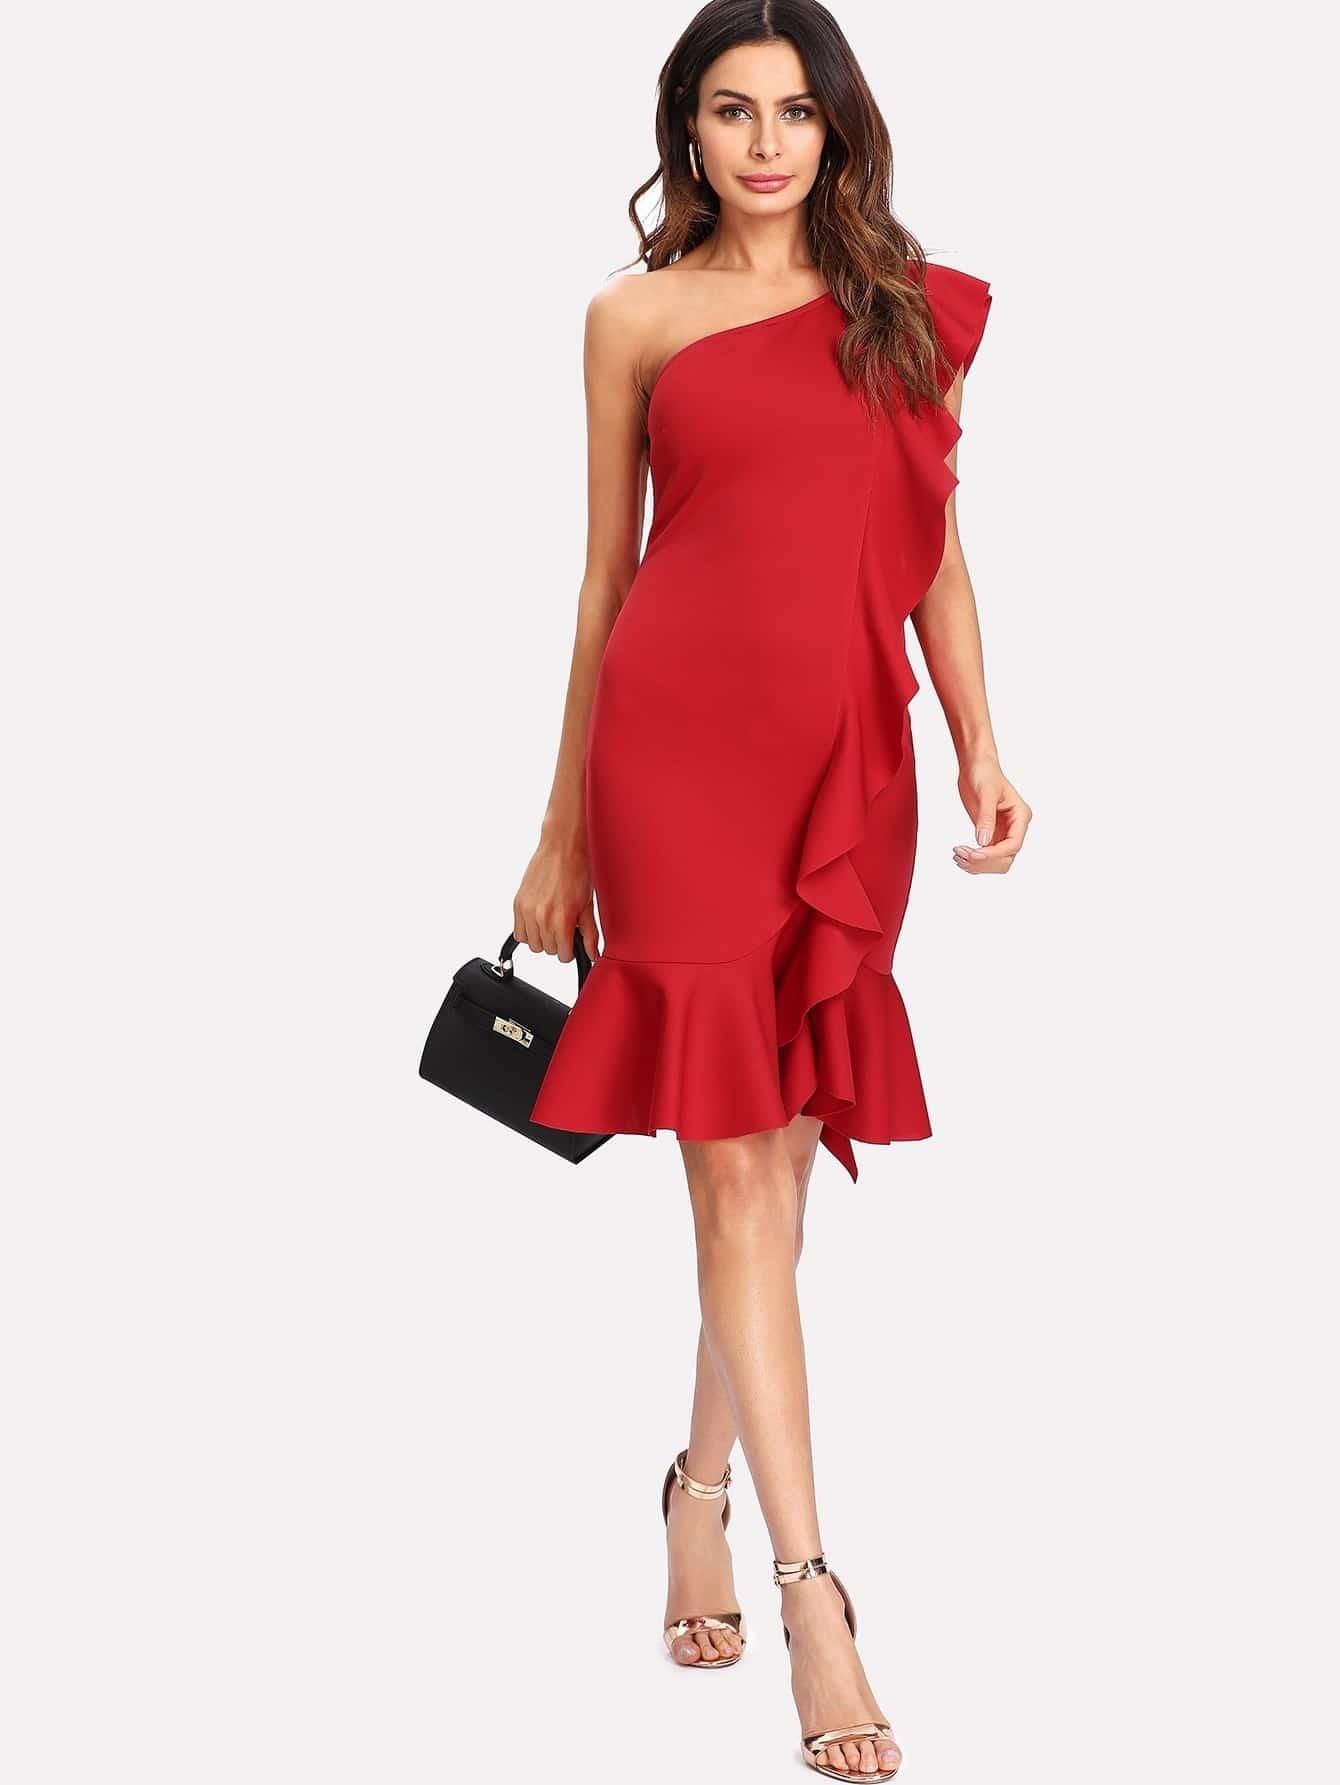 One Shoulder Ruffle Embellished Dress one shoulder ruffle embellished dress